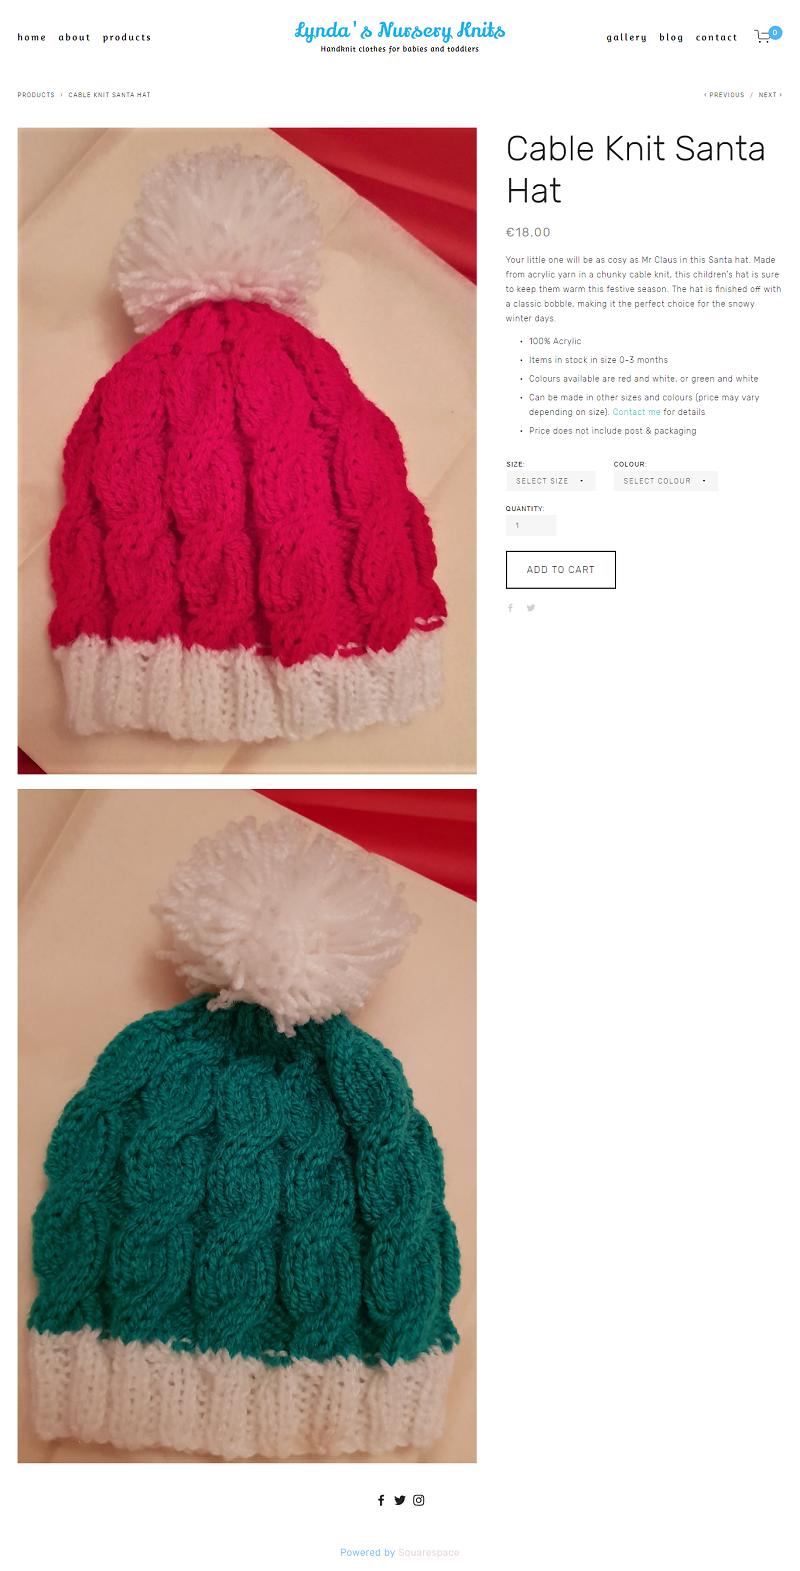 Cable Knit Santa Hat -